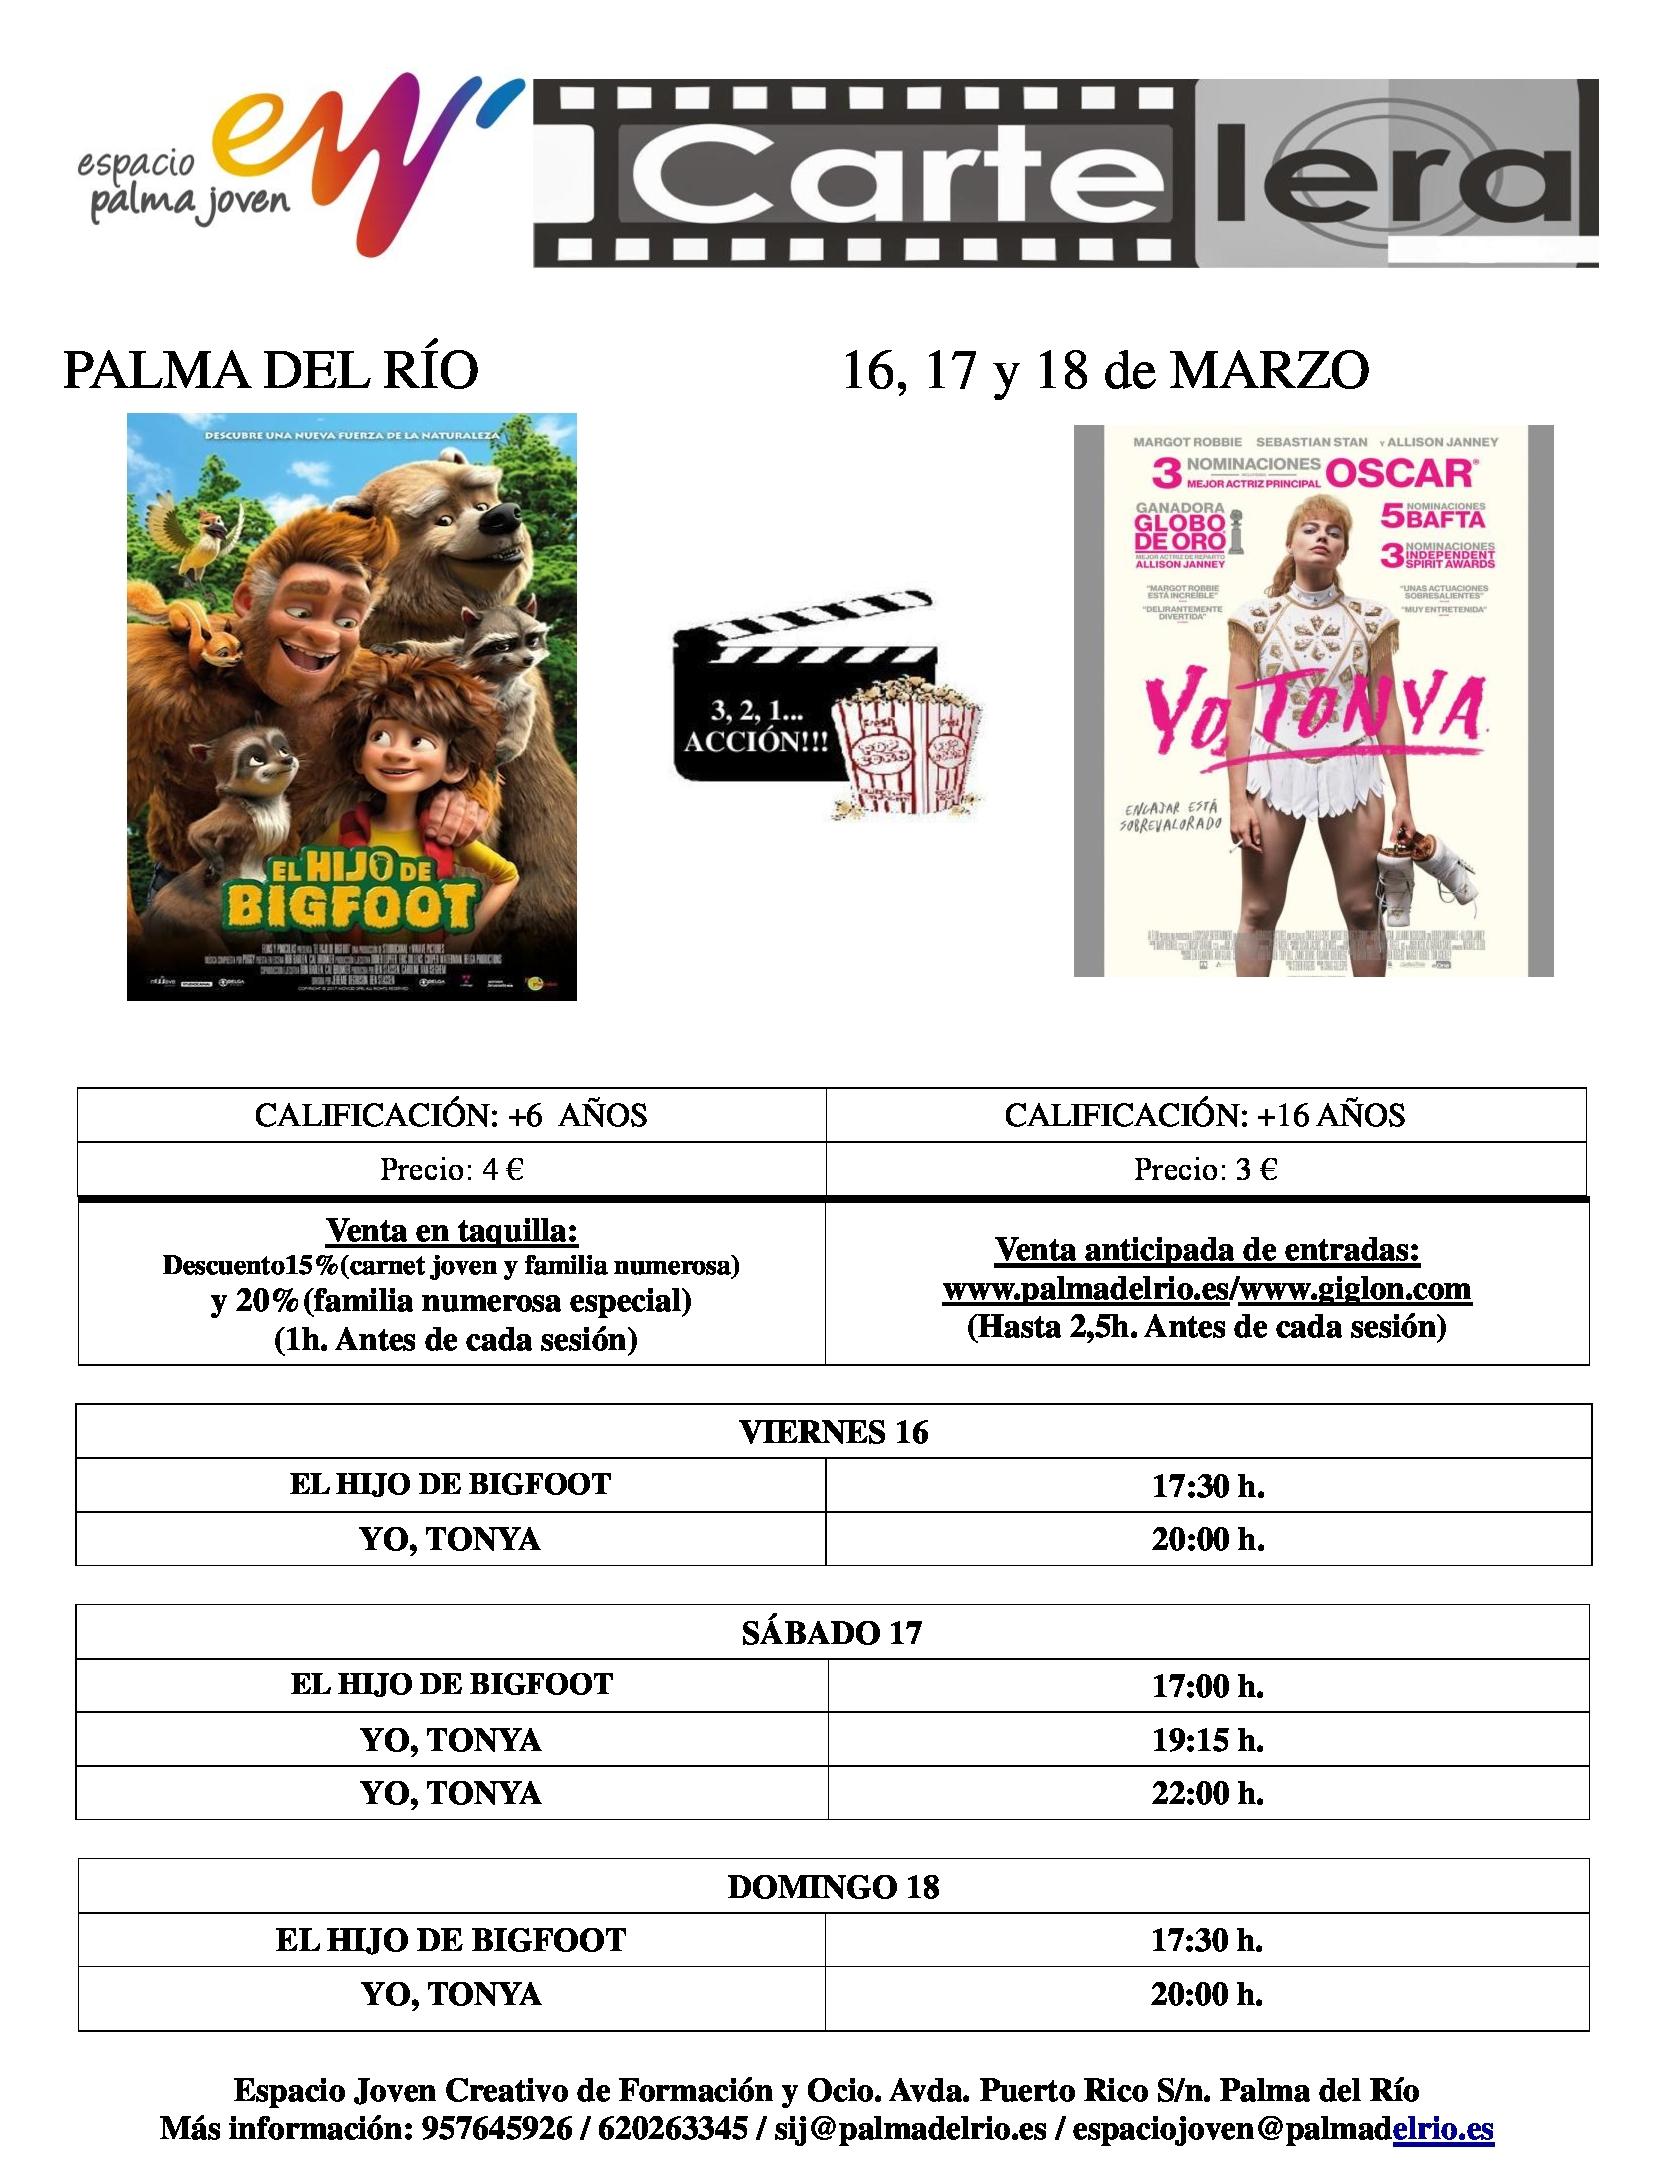 https://www.palmadelrio.es/sites/default/files/cartelera_16.17.18_marzo_2018.jpg